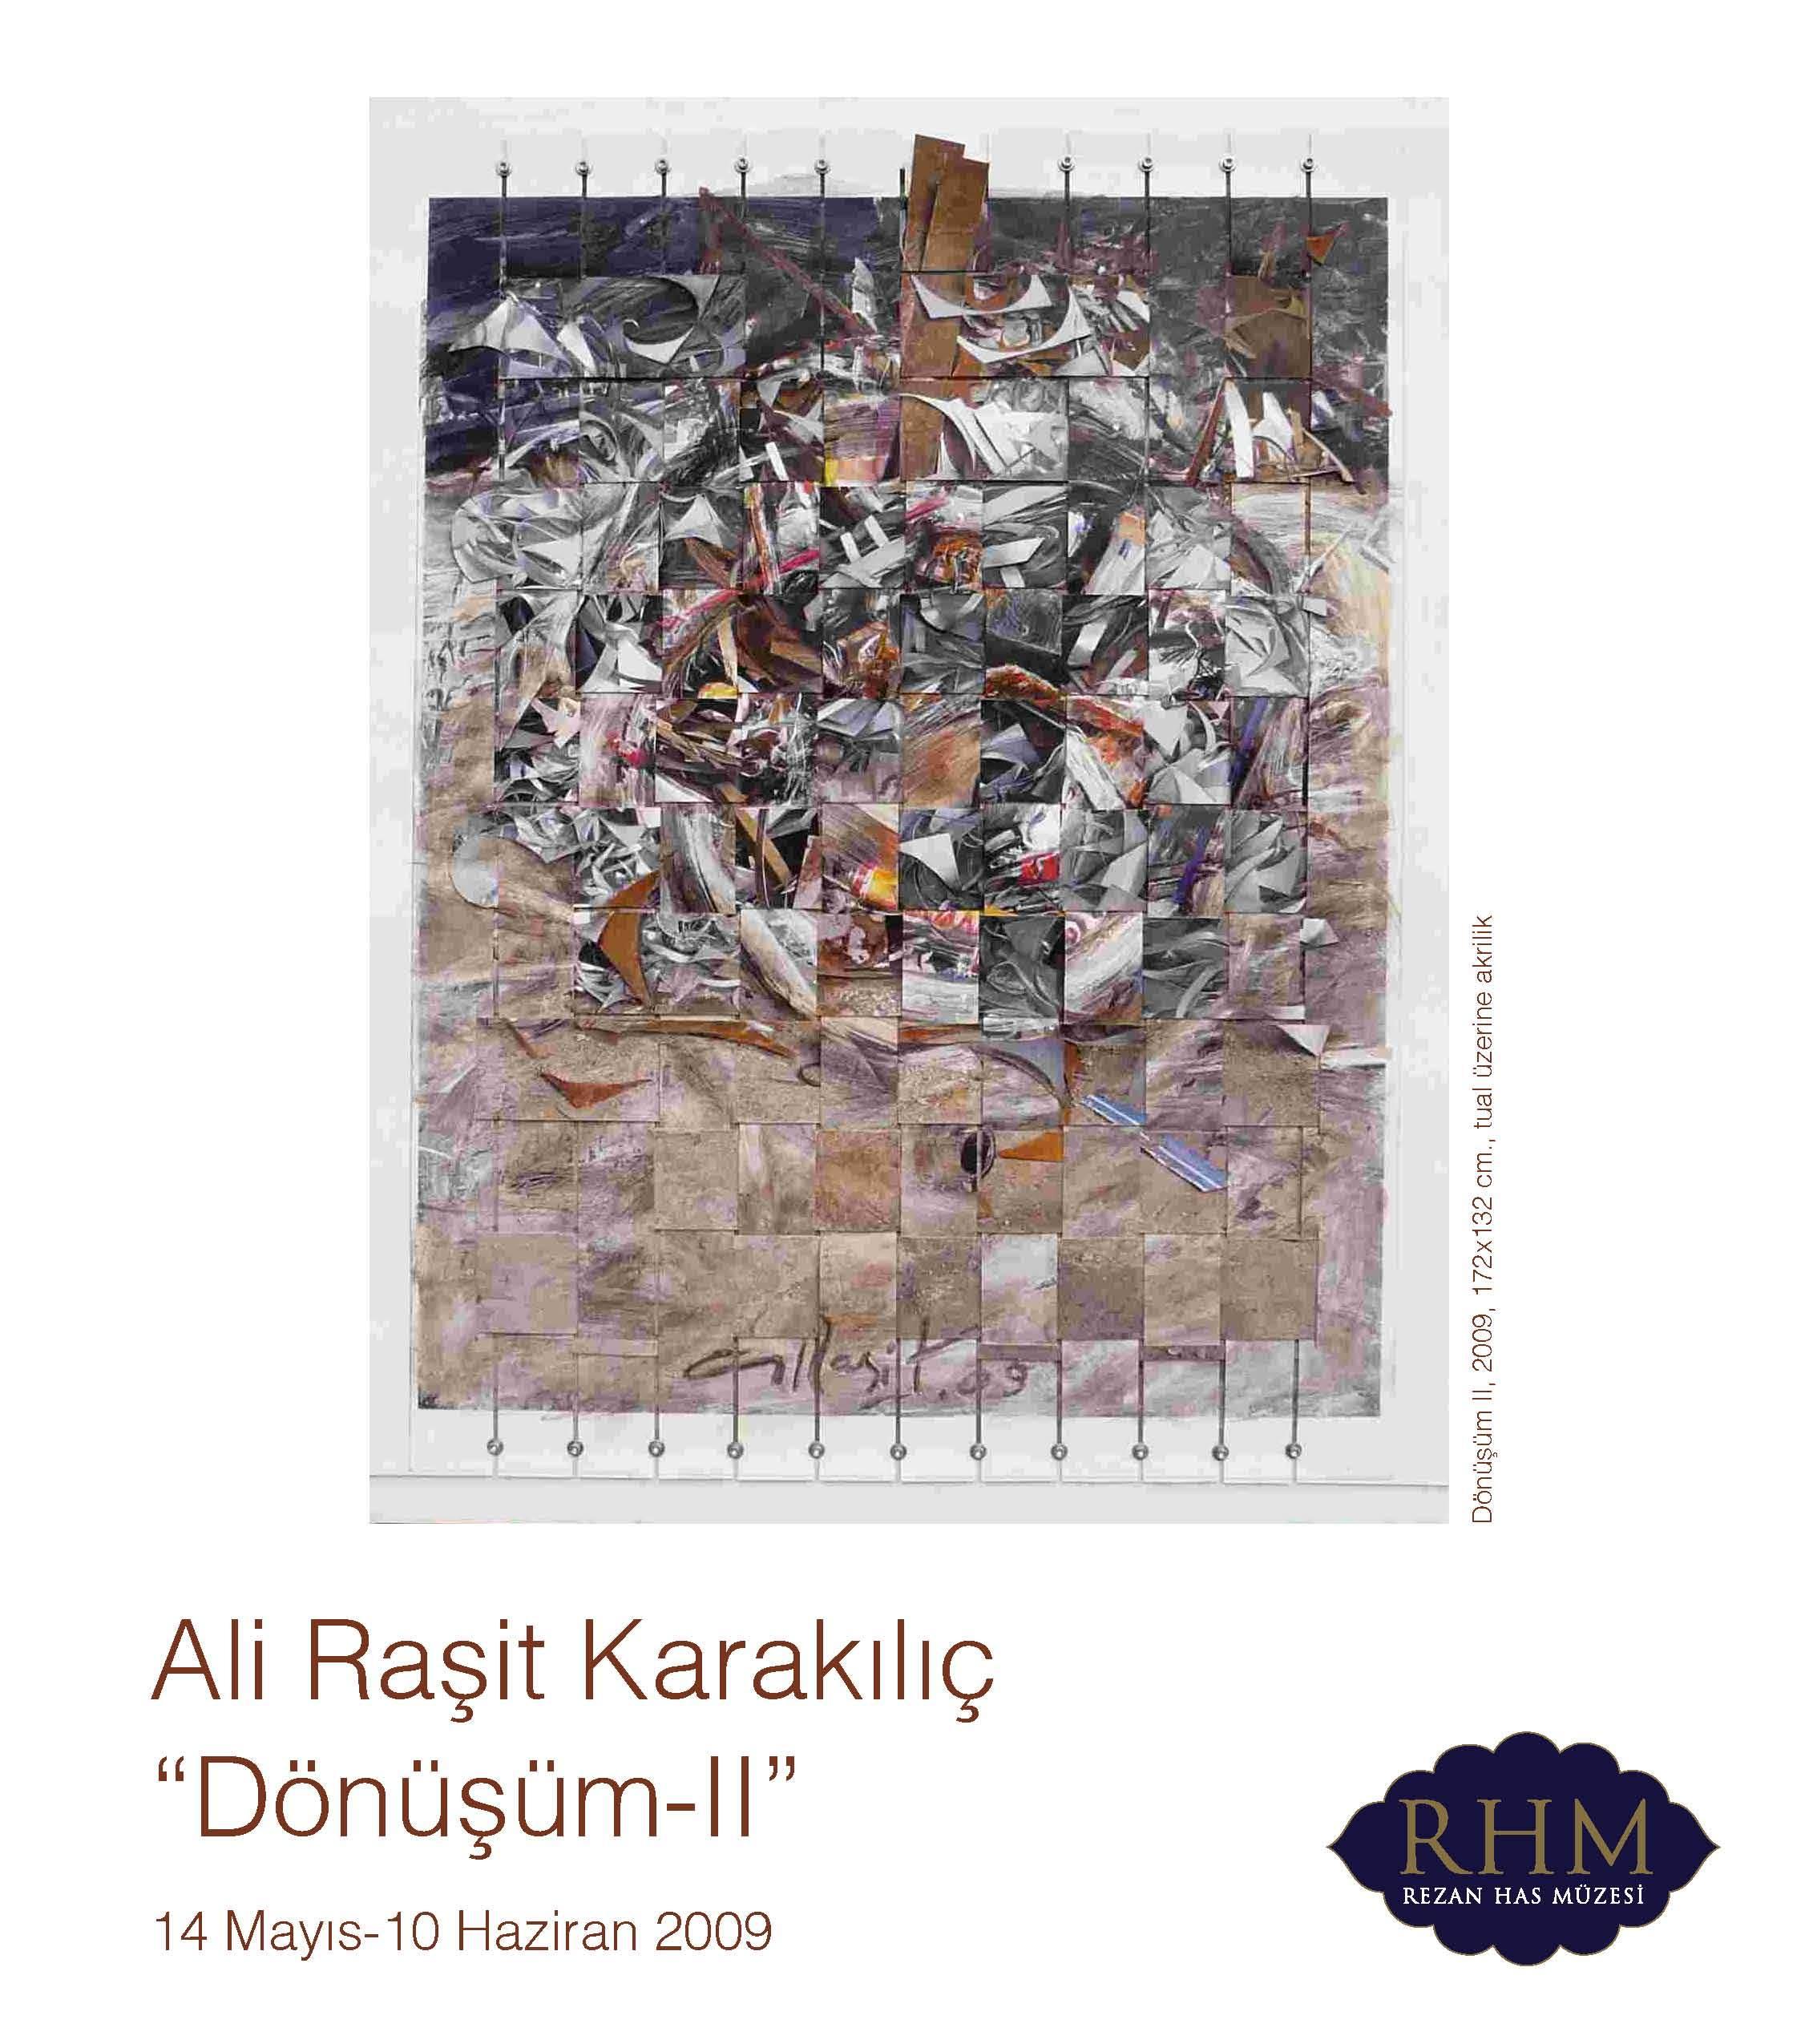 donusum poster